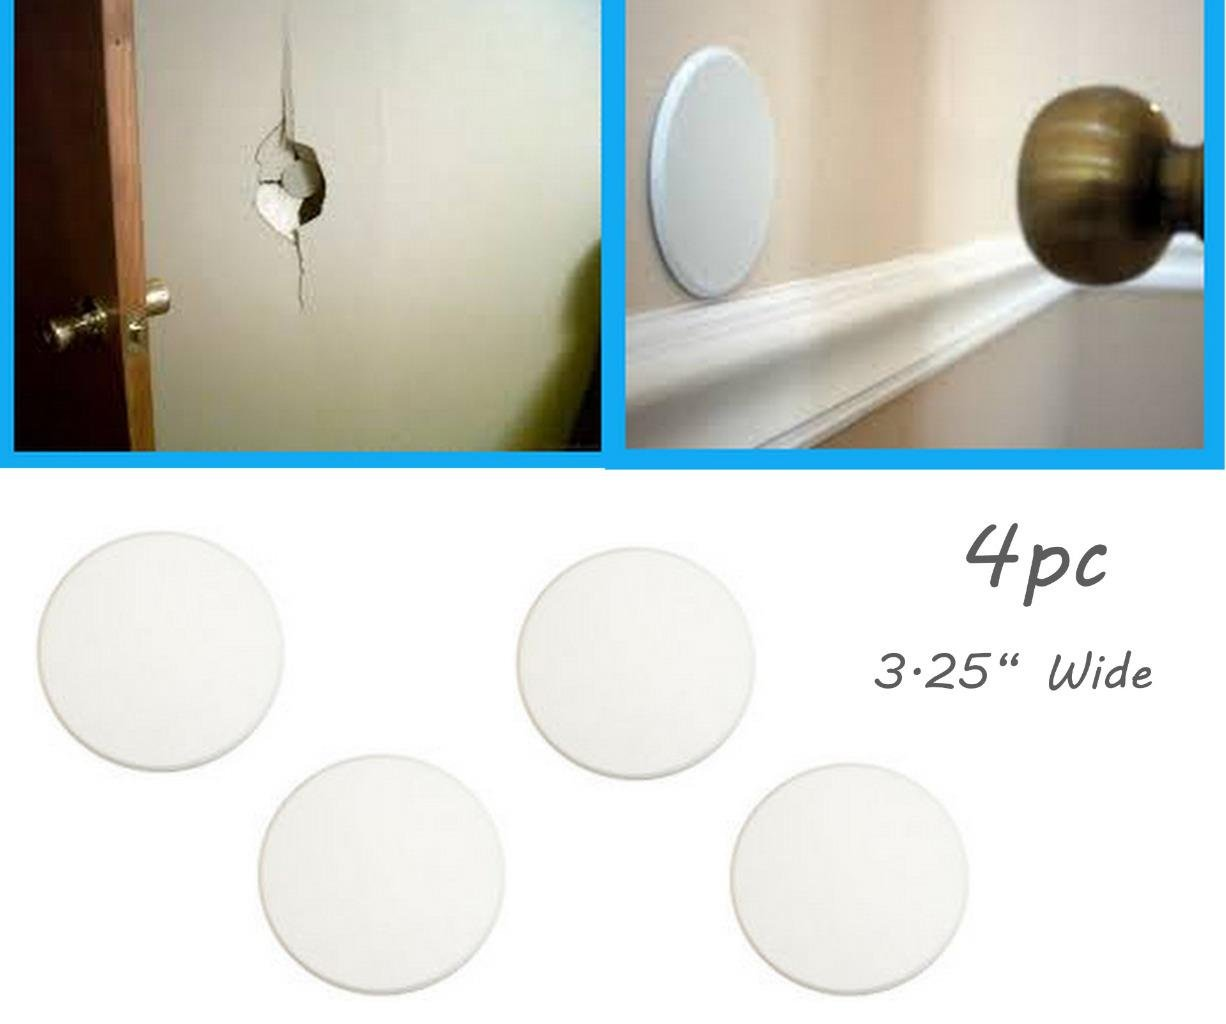 Amazon.com : 4pc ALAZCO Door Knob Wall Protector Shield Plates Round ...